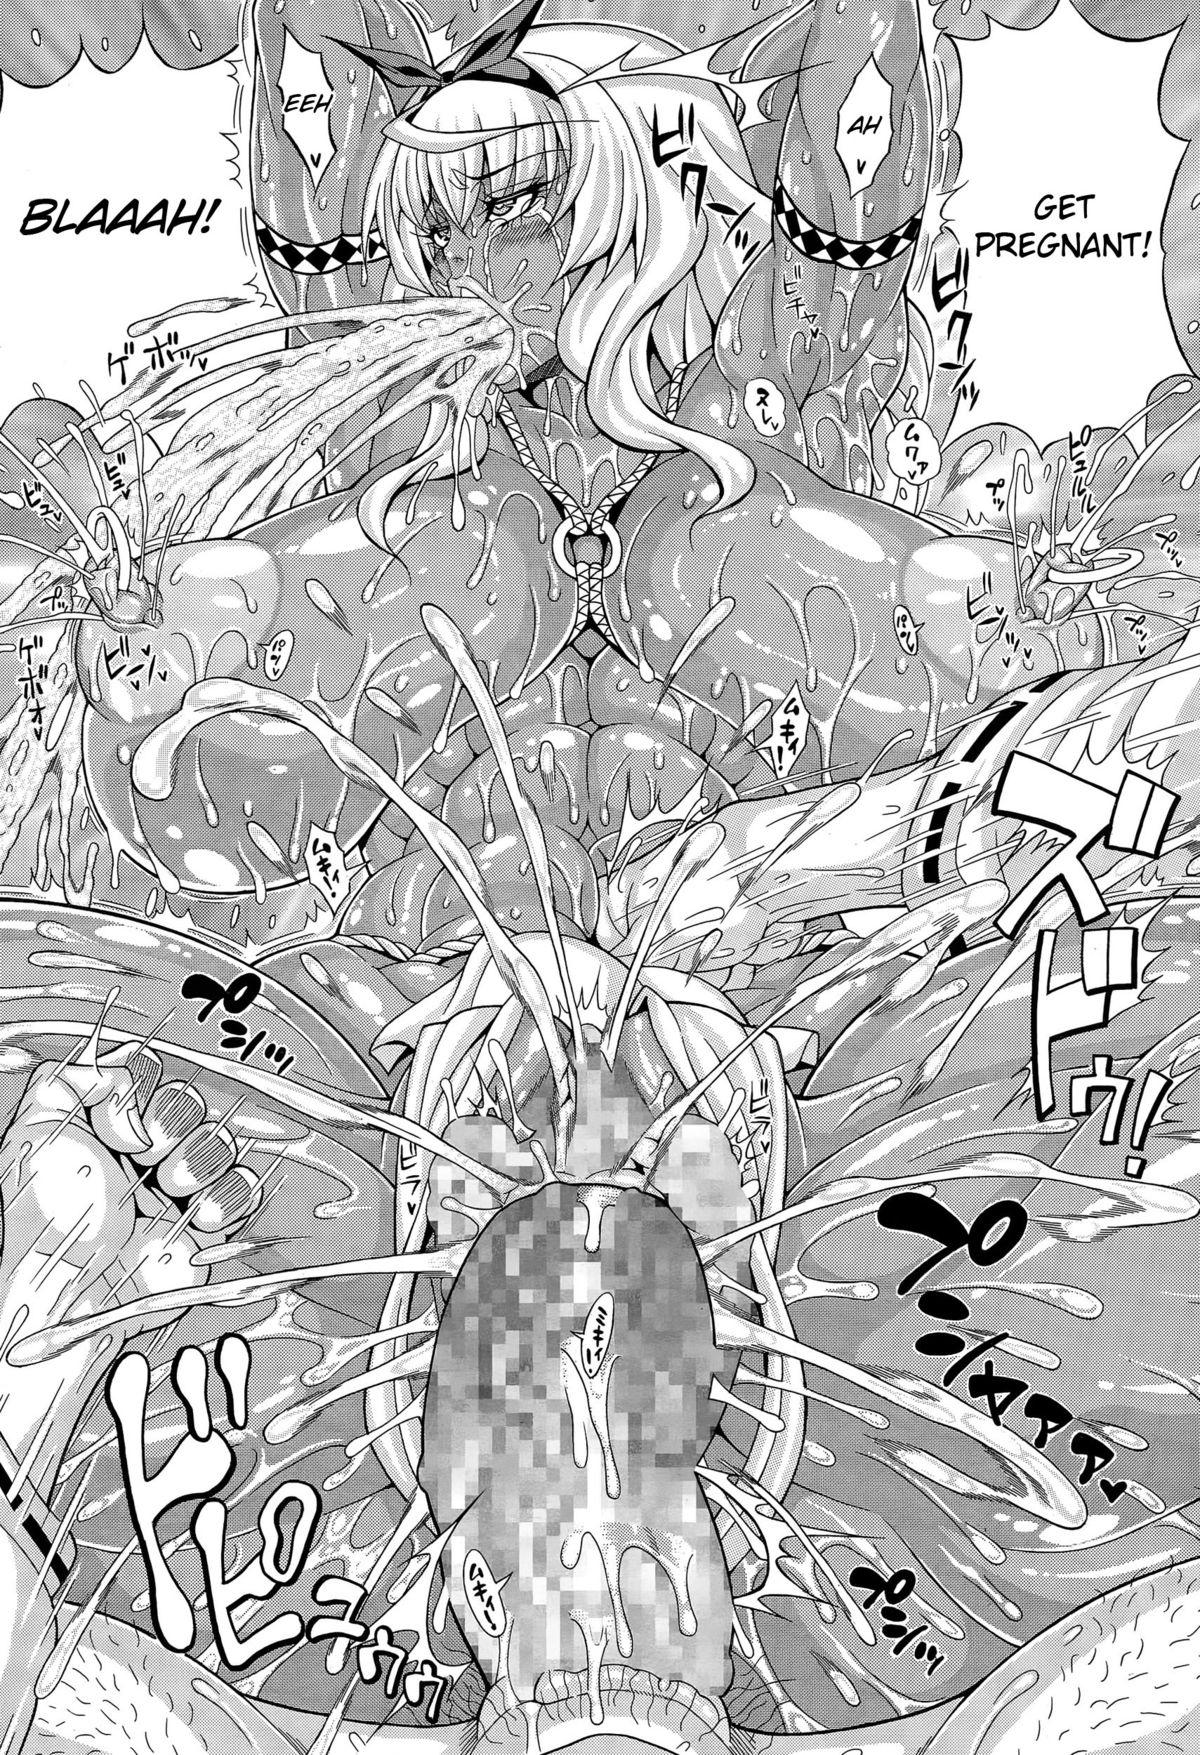 [Andou Hiroyuki] Mahoutsukai Musou ~Sengoku Pakohime Kasshoku Kinniku Onna Hen~   Peerless 30 Year Old Virgin - Warring States Muscled Brown Fuck Princess (COMIC Tenma 2015-06) [English] [Natty Translations] 17